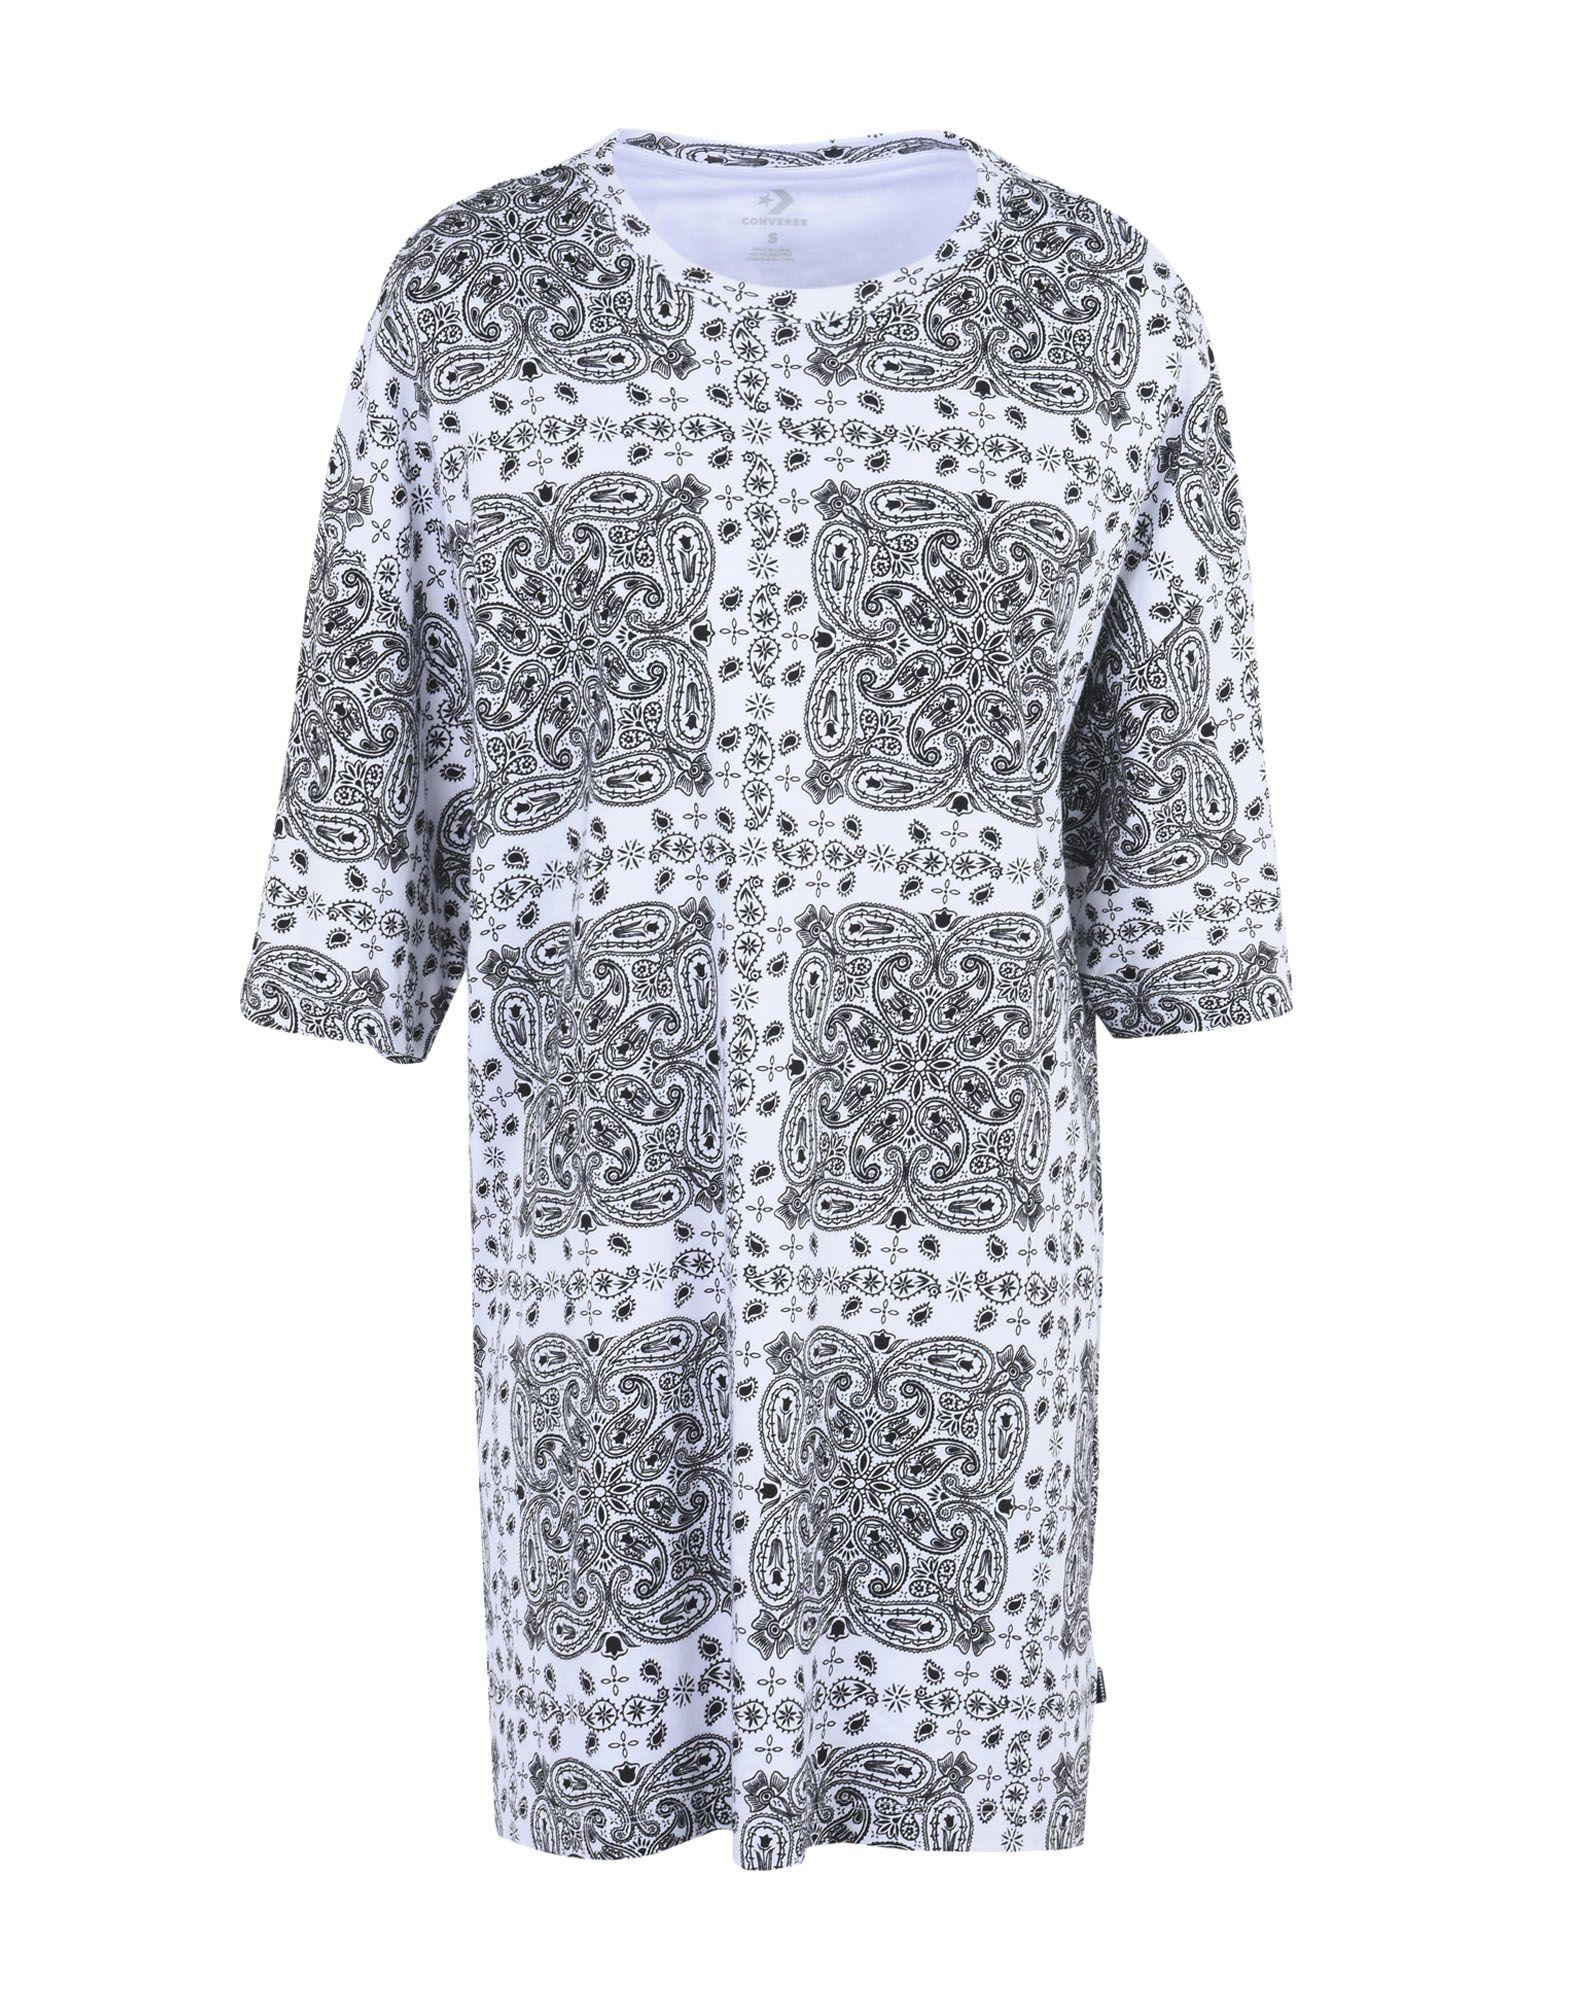 CONVERSE X MILEY CYRUS Короткое платье холст 60x90 printio miley cyrus